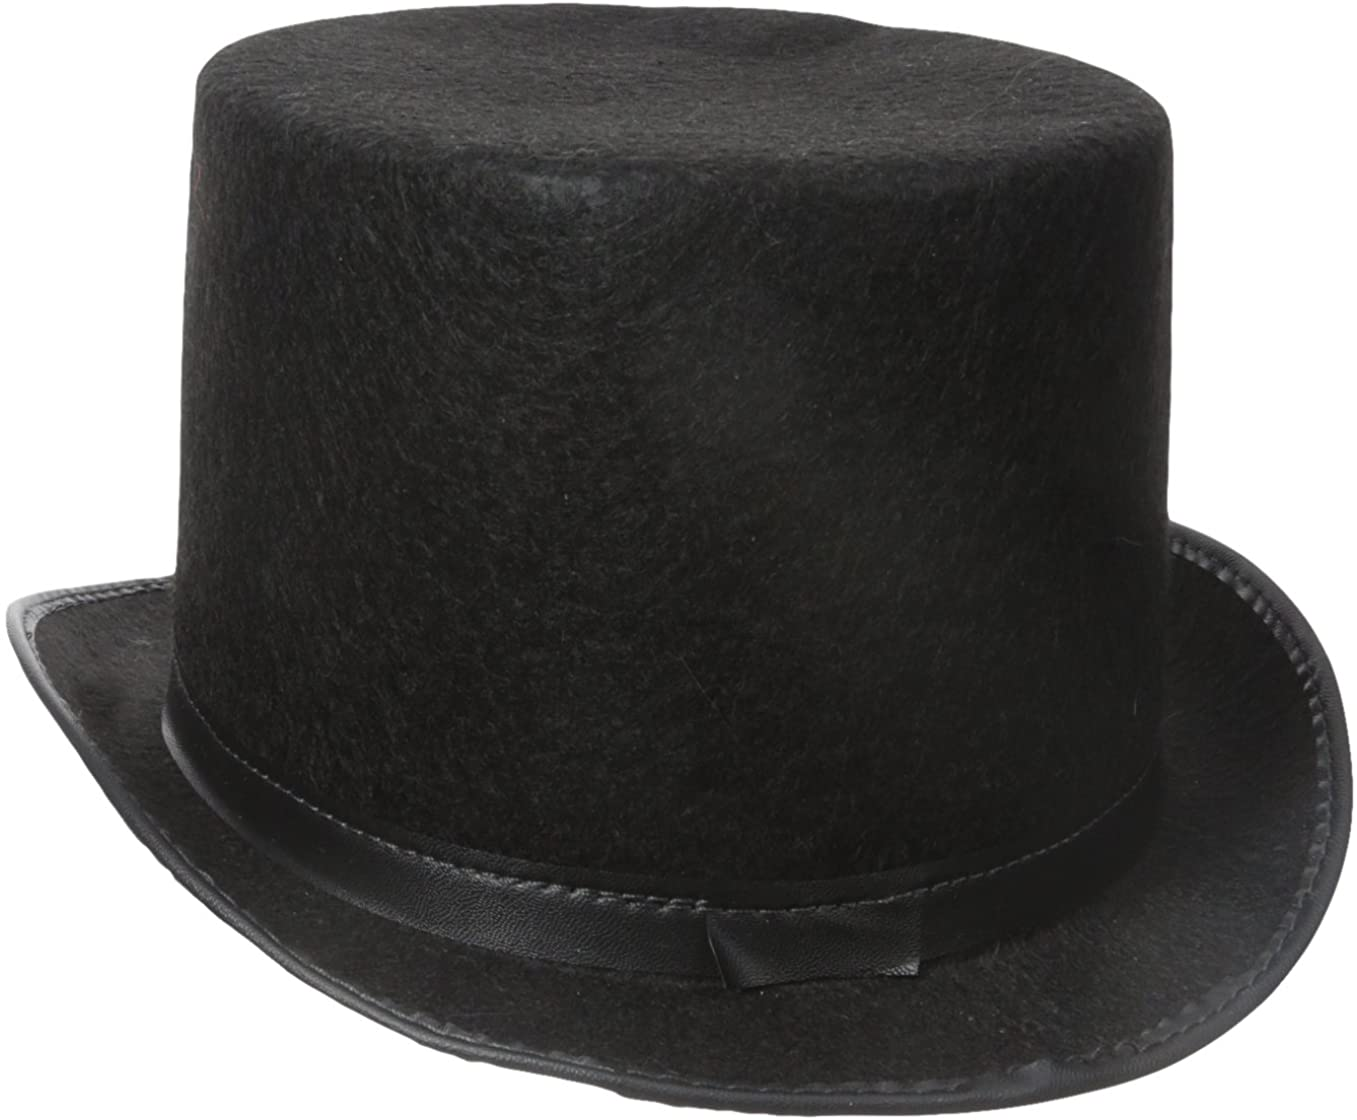 Jacobson Hat Company Men's Permalux Top Hat